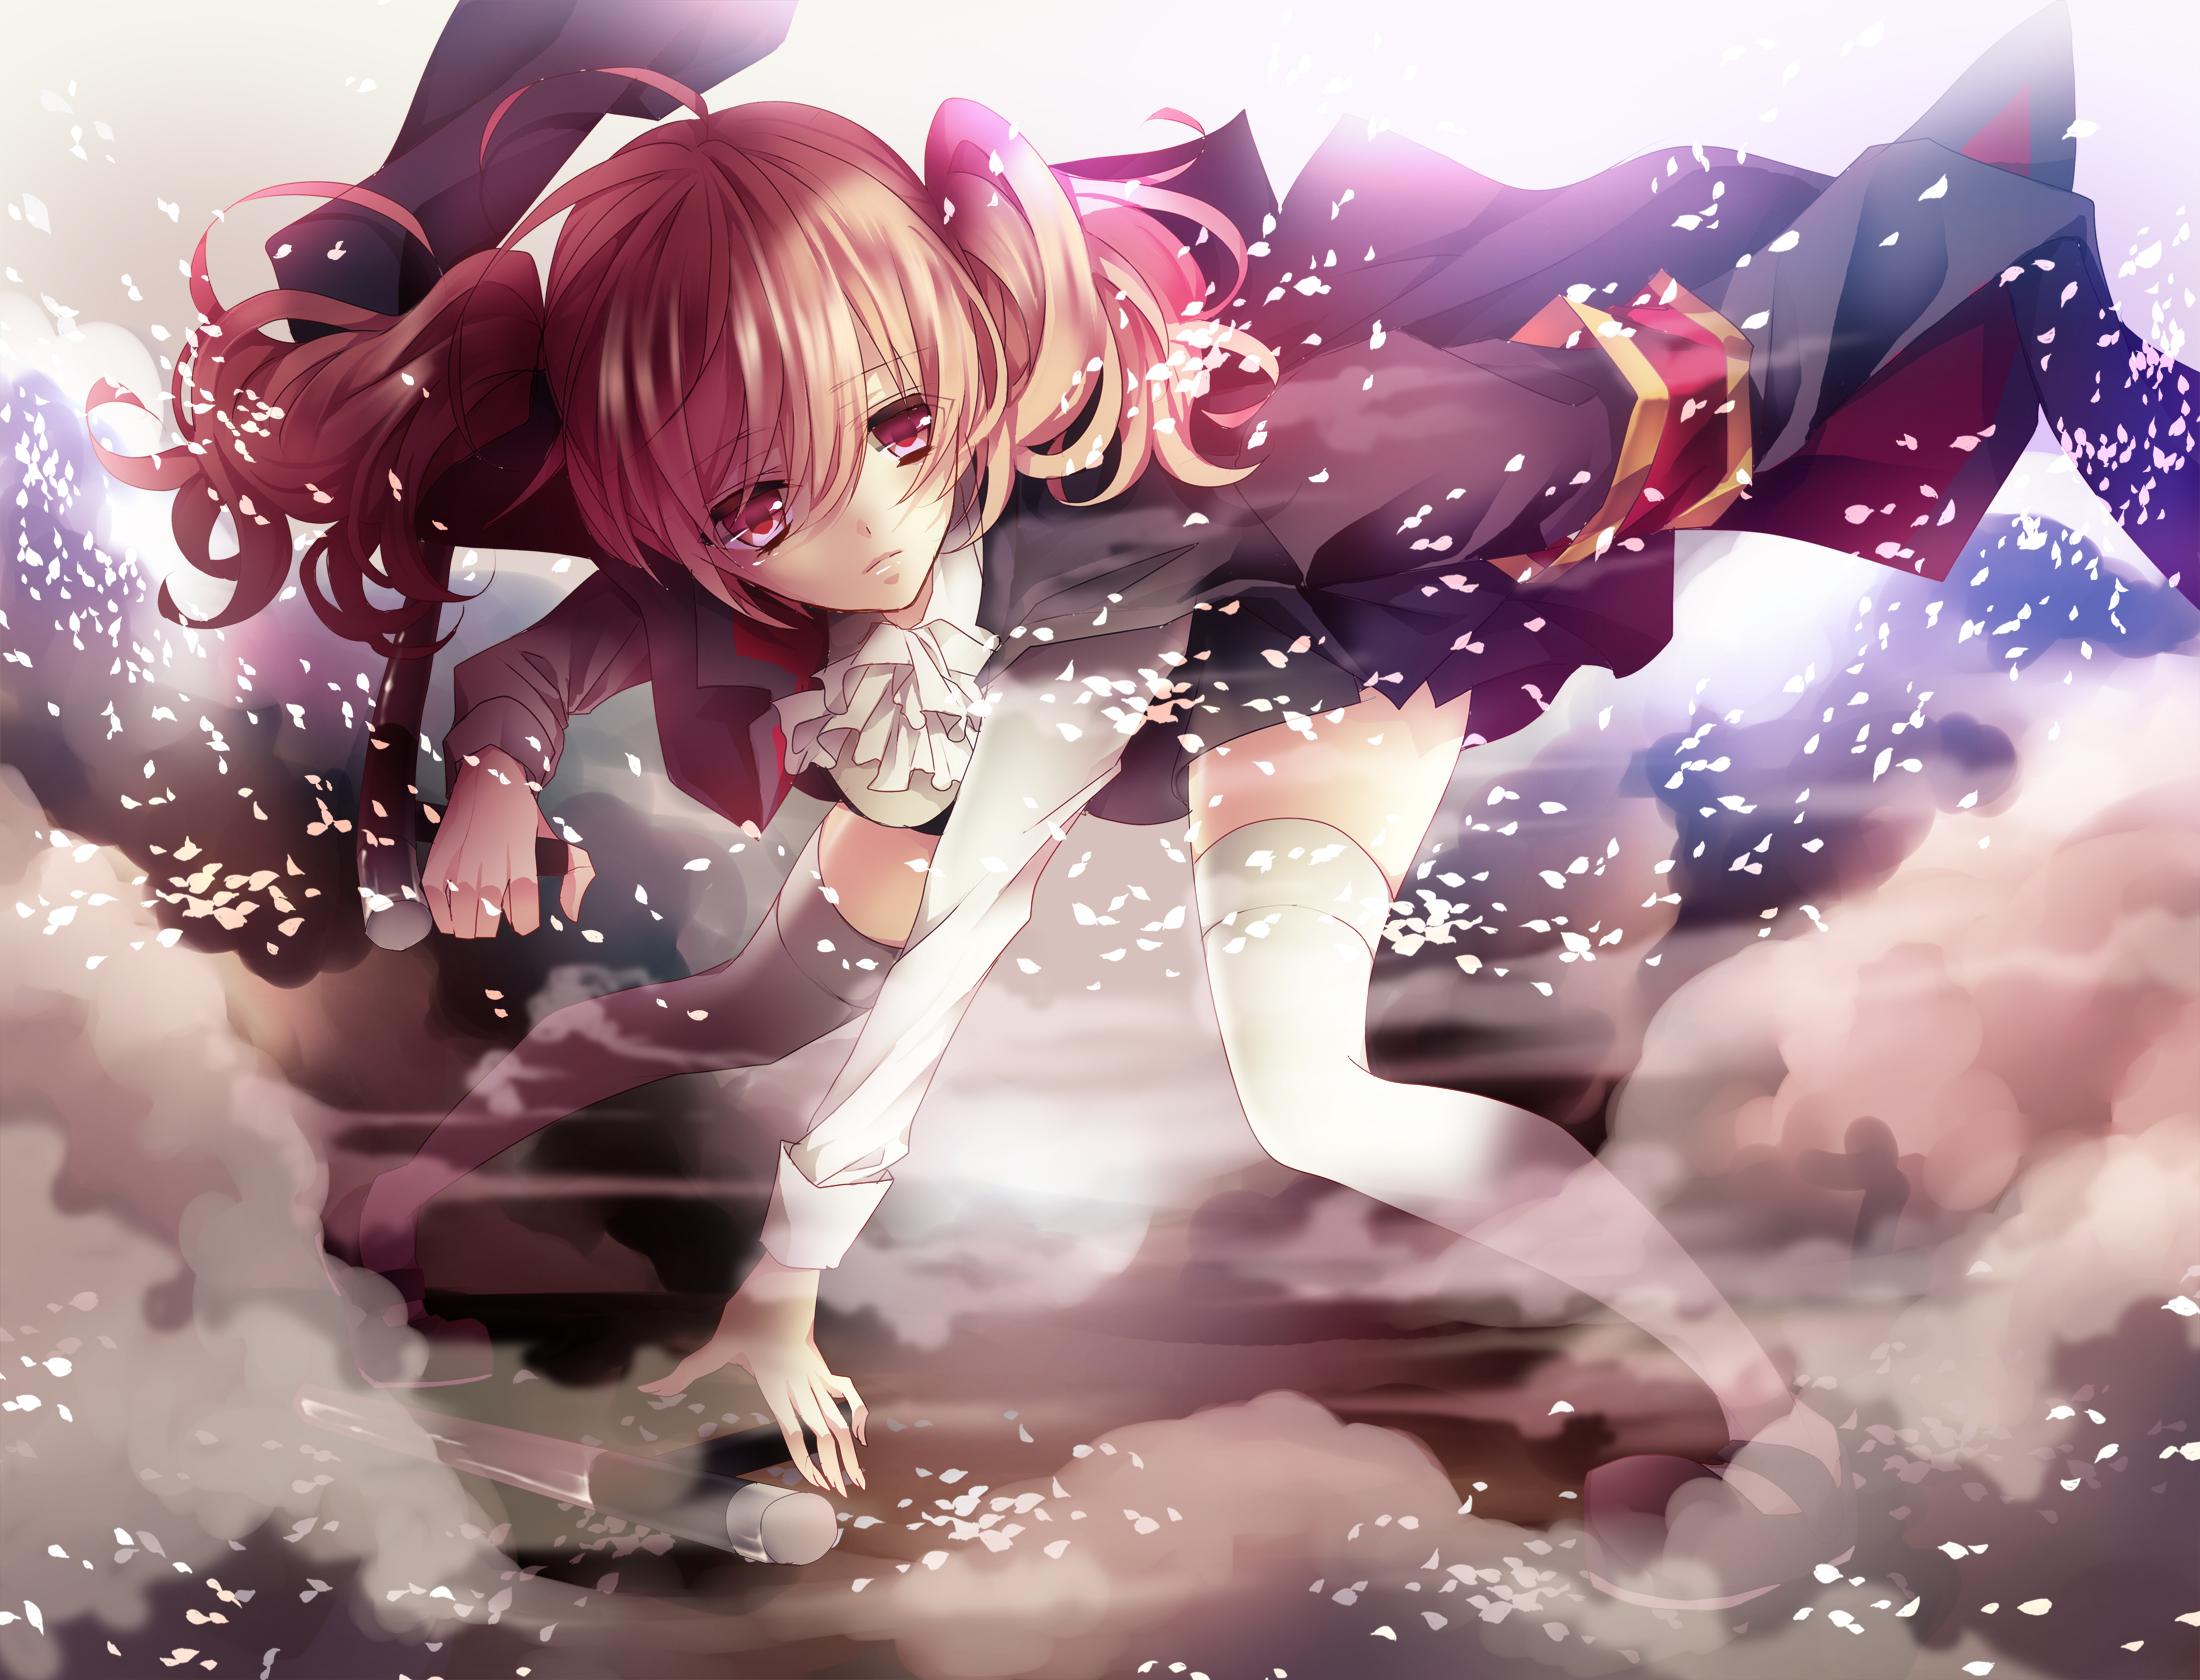 Inu Boku SS HD Wallpaper Background Image 2200x1680 2200x1680